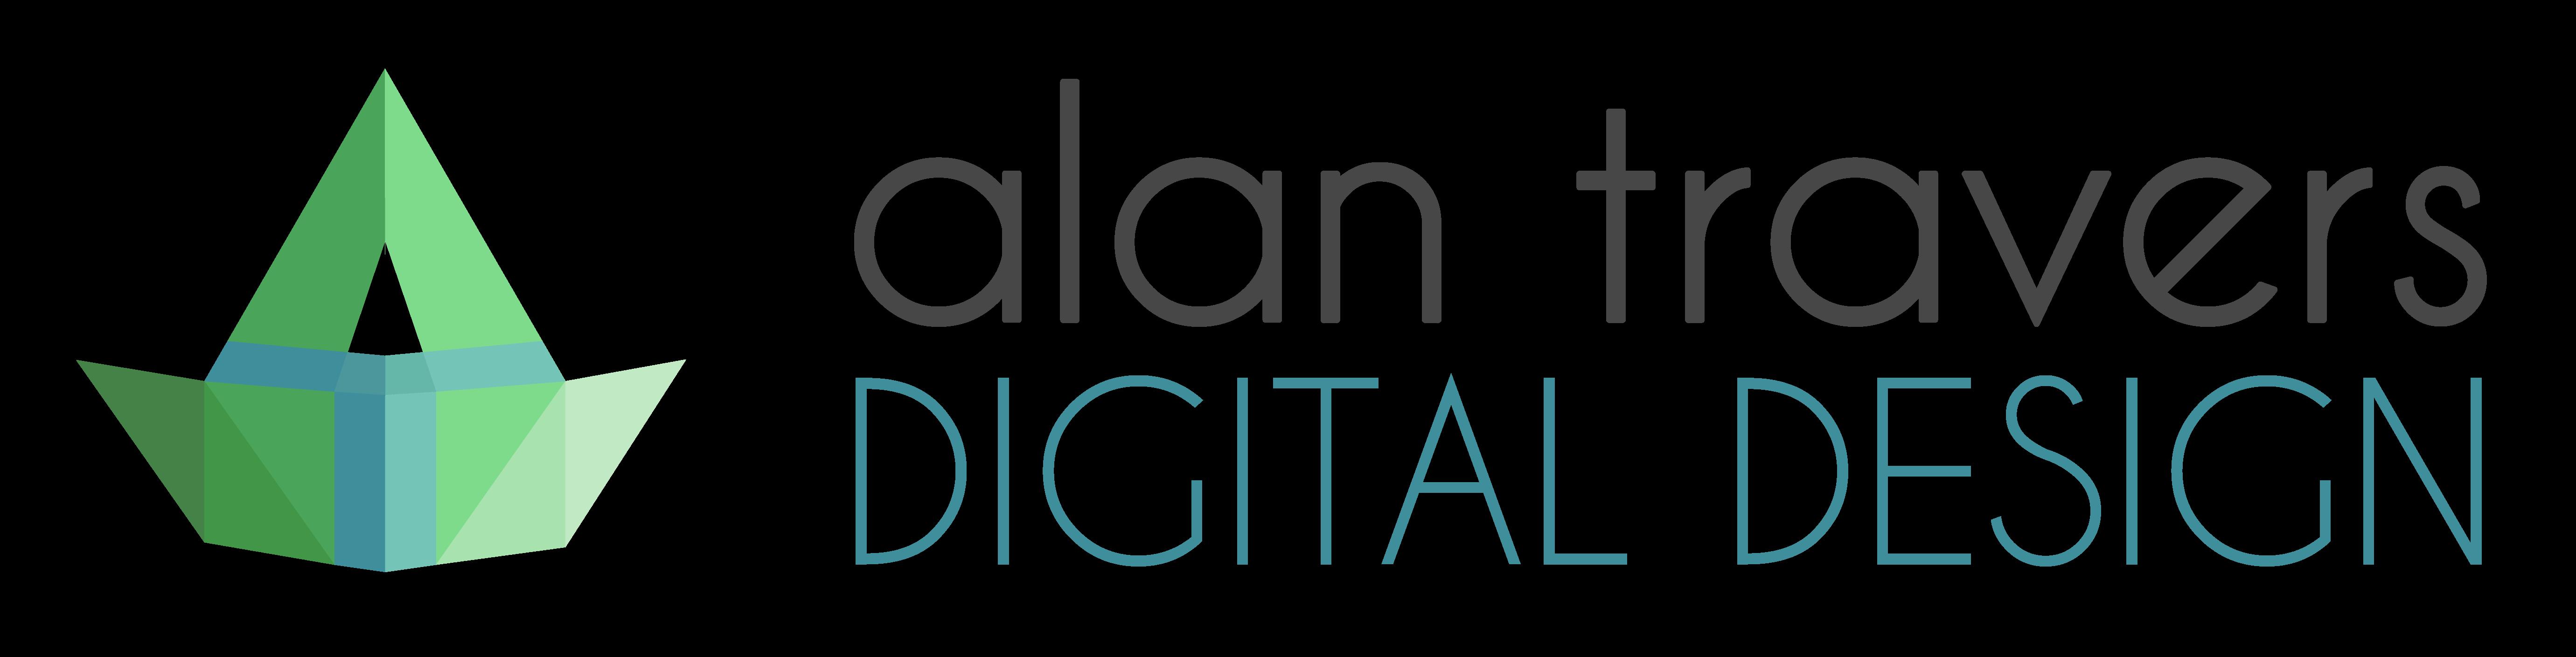 Alan Travers Digital Design Logo 2021